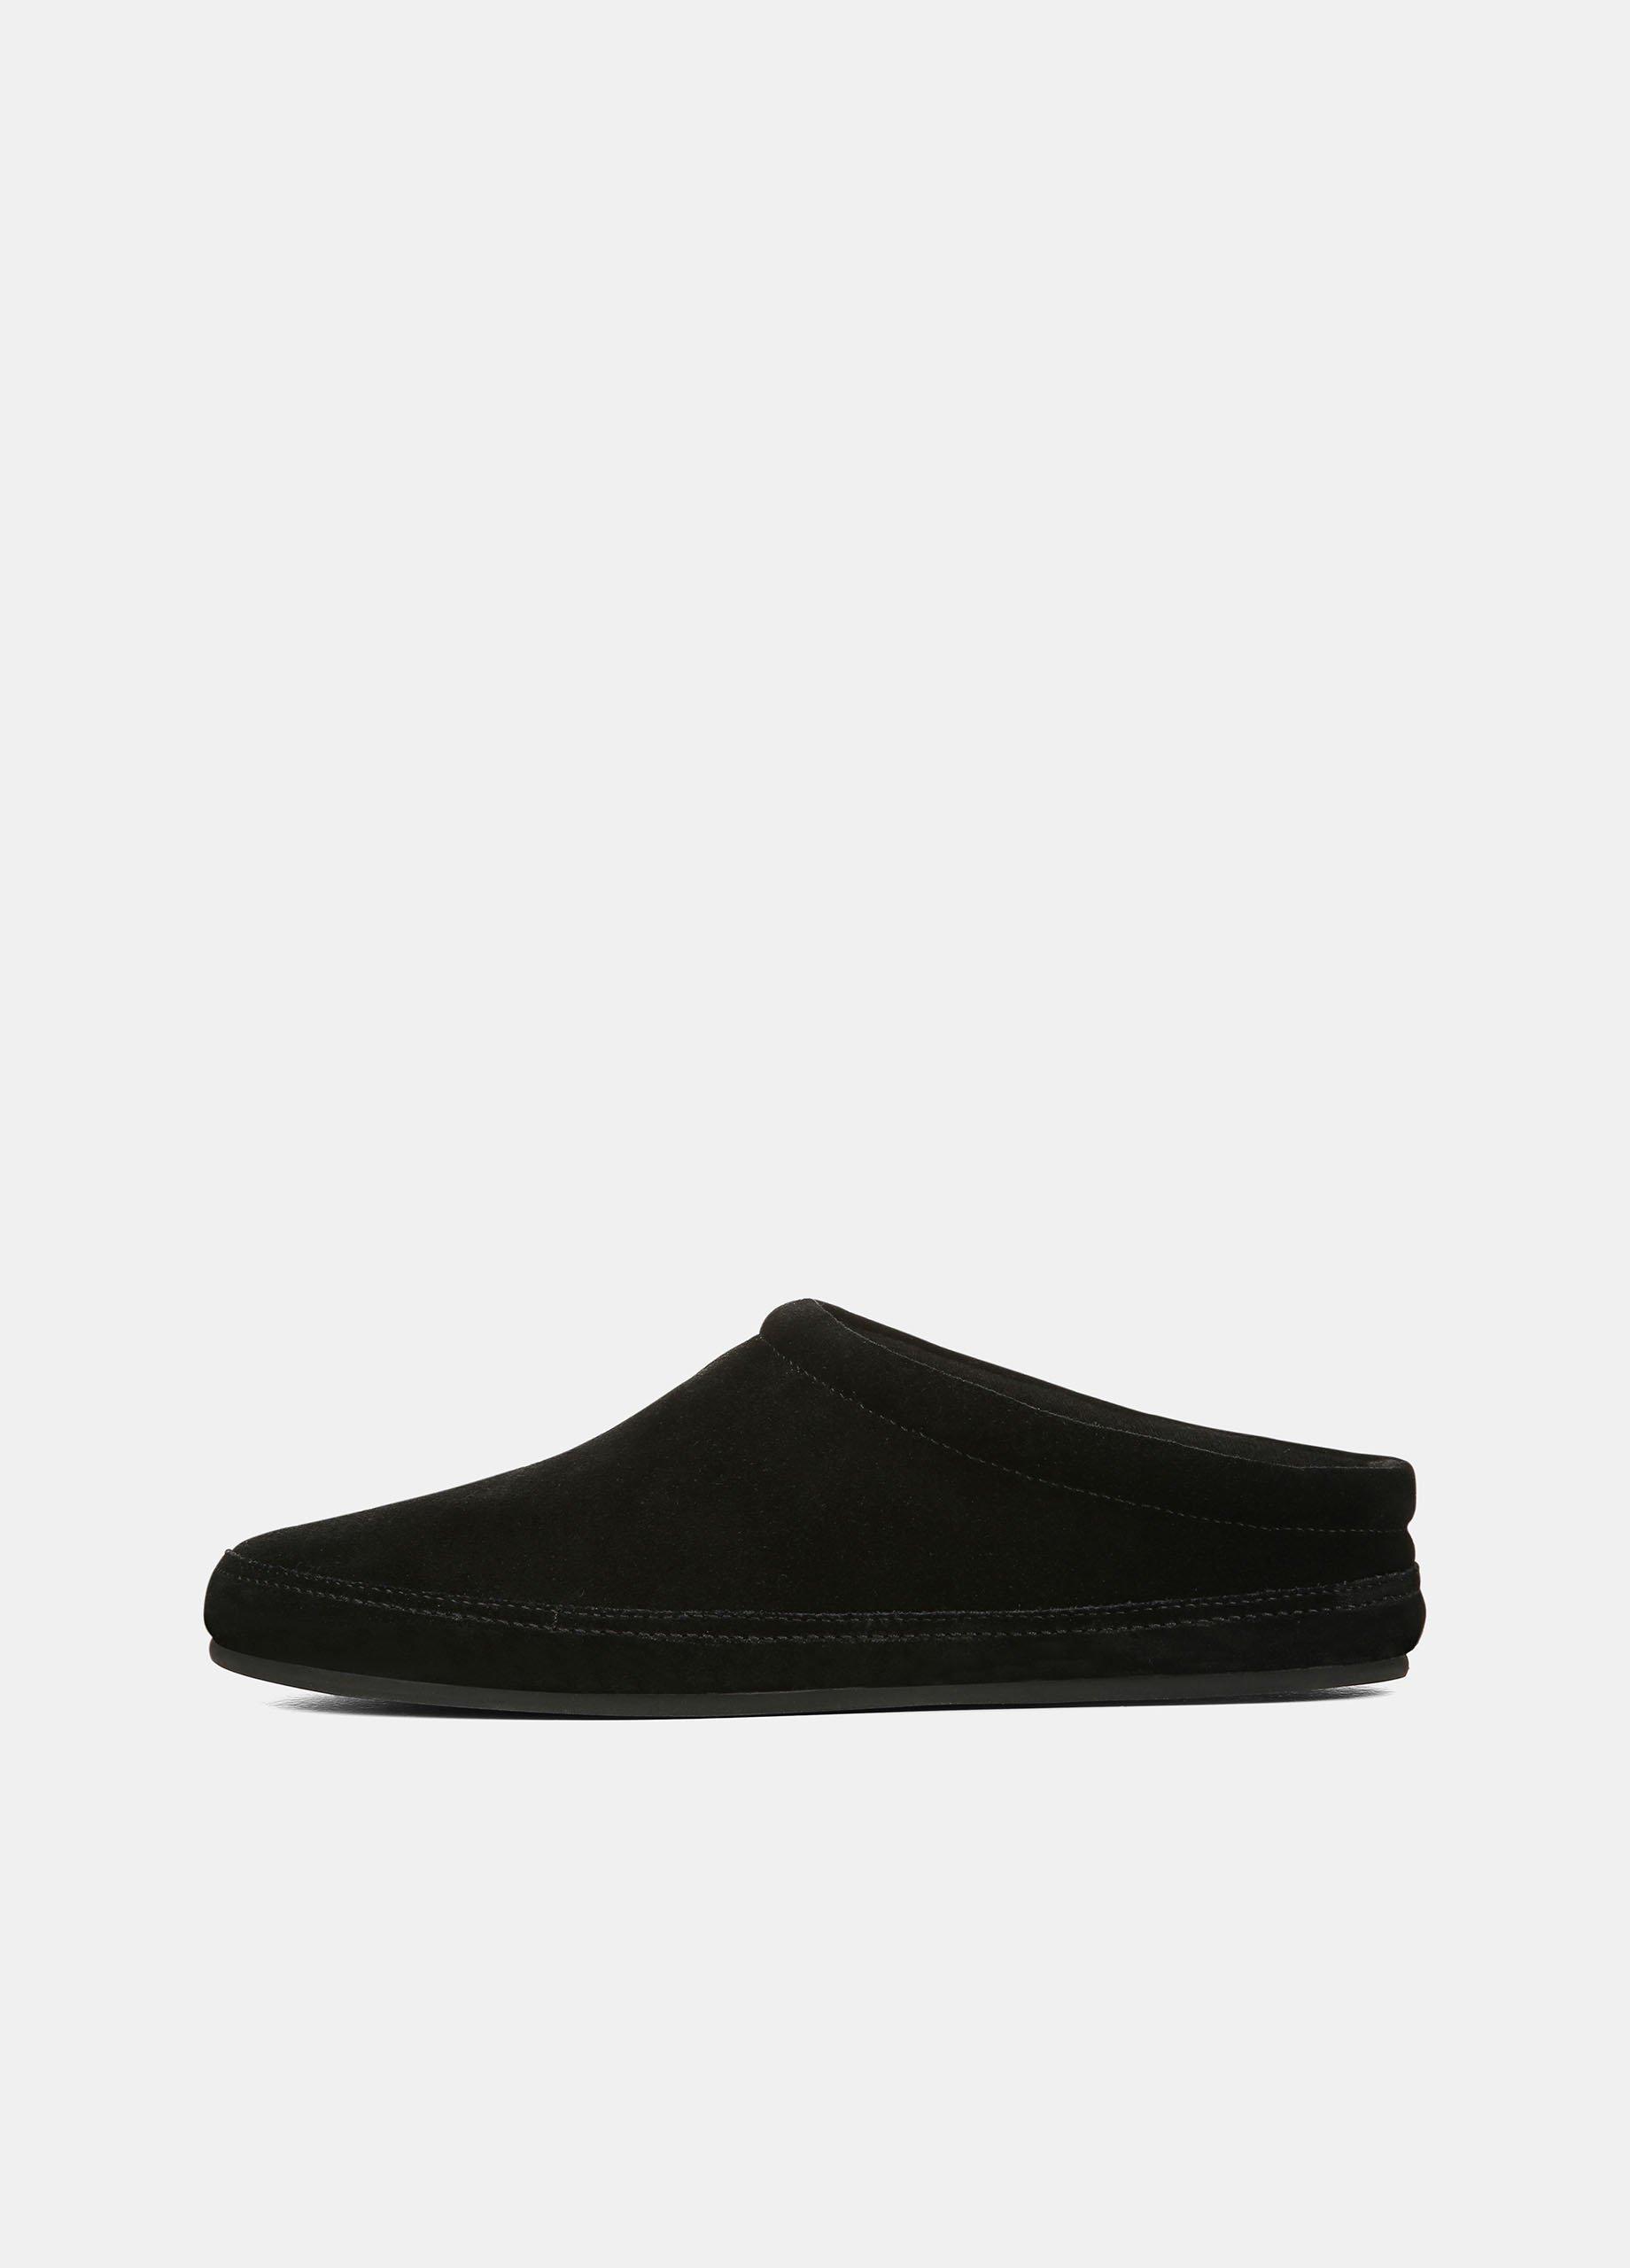 Leather Howell Slip-On